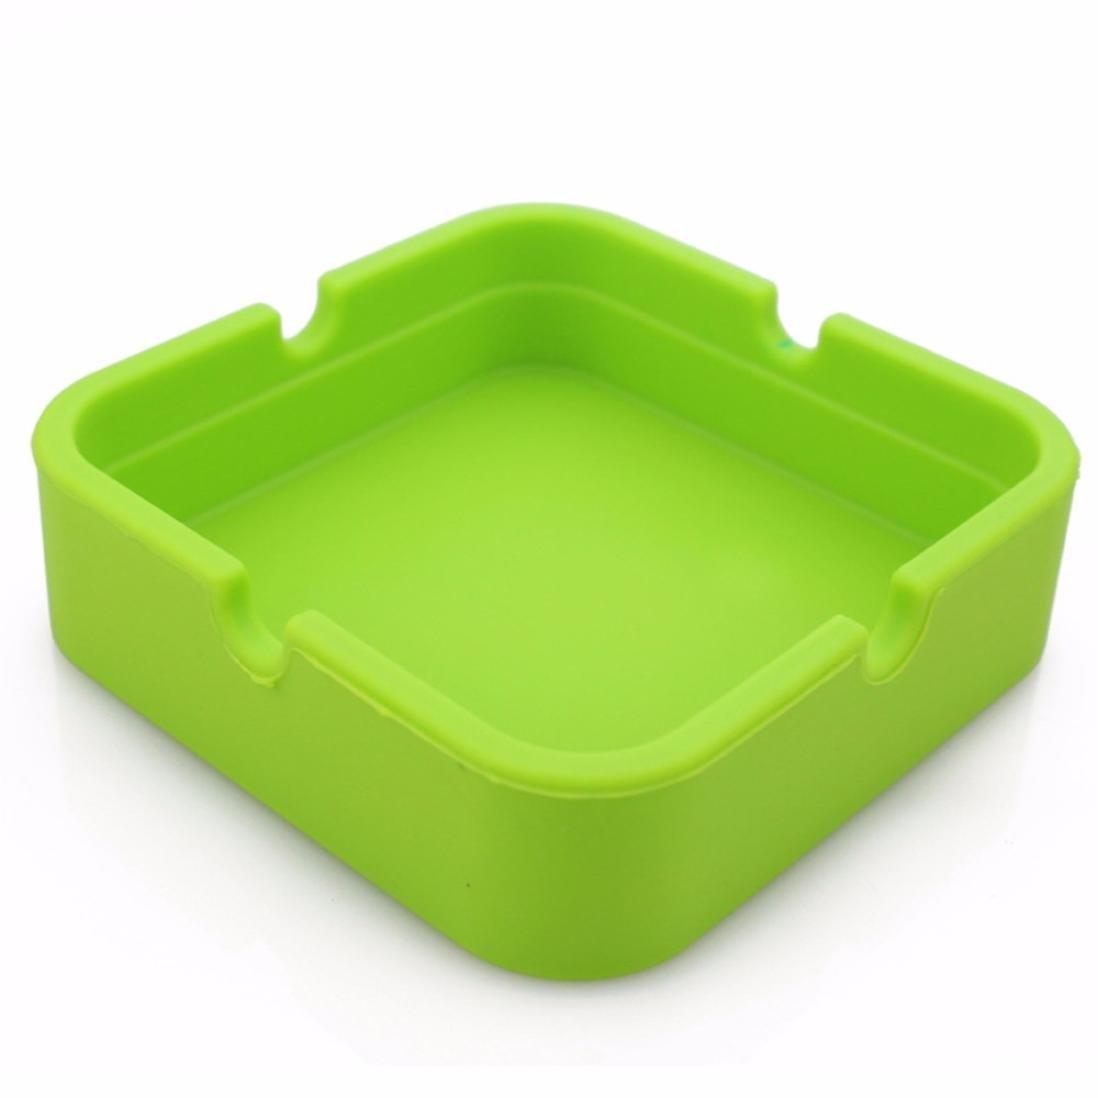 Bowake Clearance Sale! Colorful Eco-Friendly Premium Silicone Rubber High Temperature Heat Resistant Square Design Ashtray (Green)